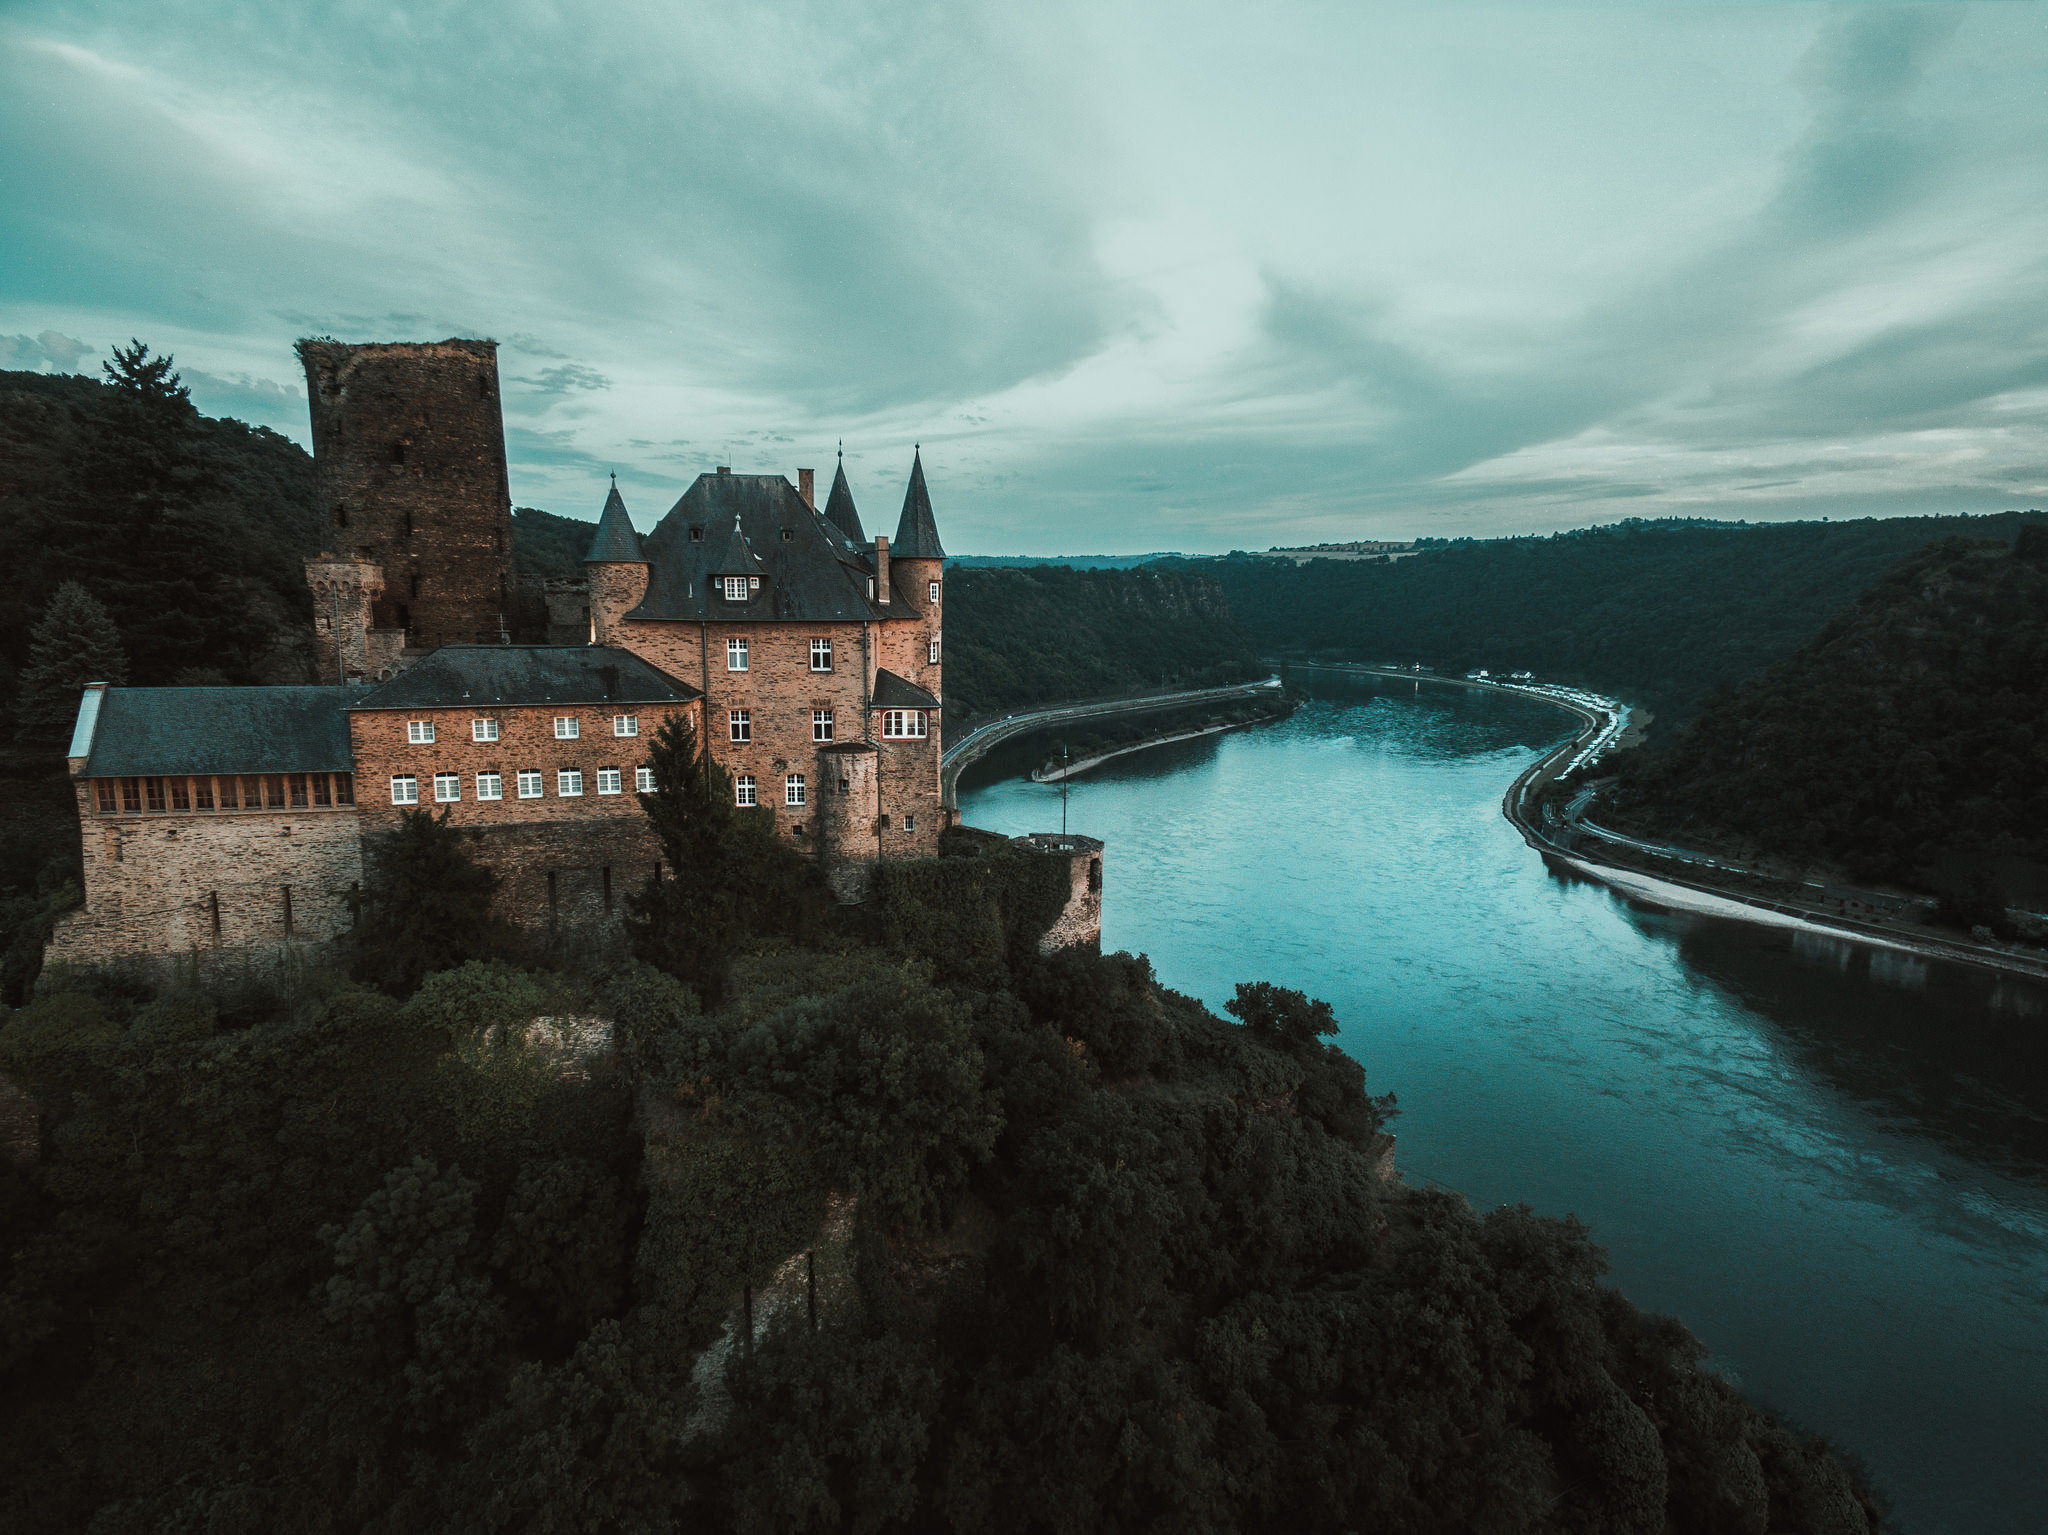 Landschaftsfotografie fotograf filmemacher frankfurt patrick schmetzer drohne landschaft natur 94